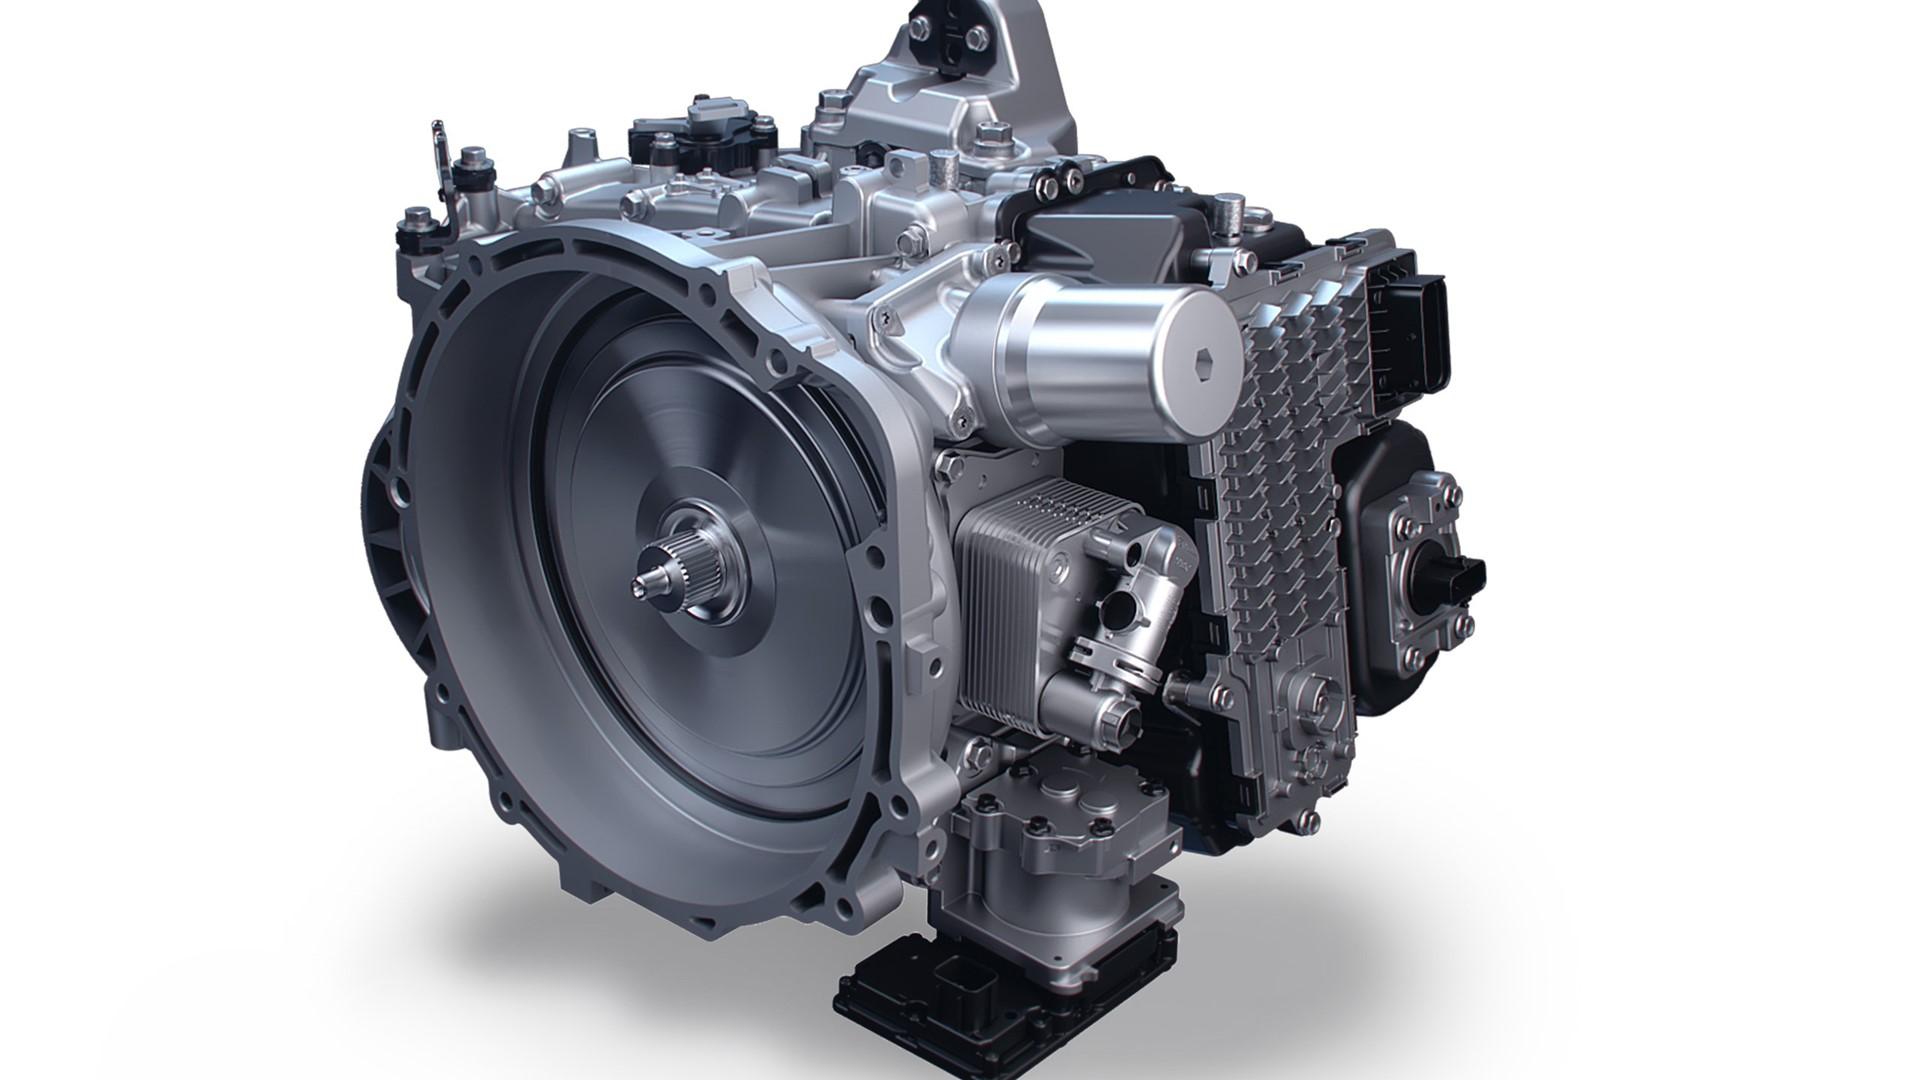 Kia announces new platform and powertrain details for next-generation Sorento - Image 4